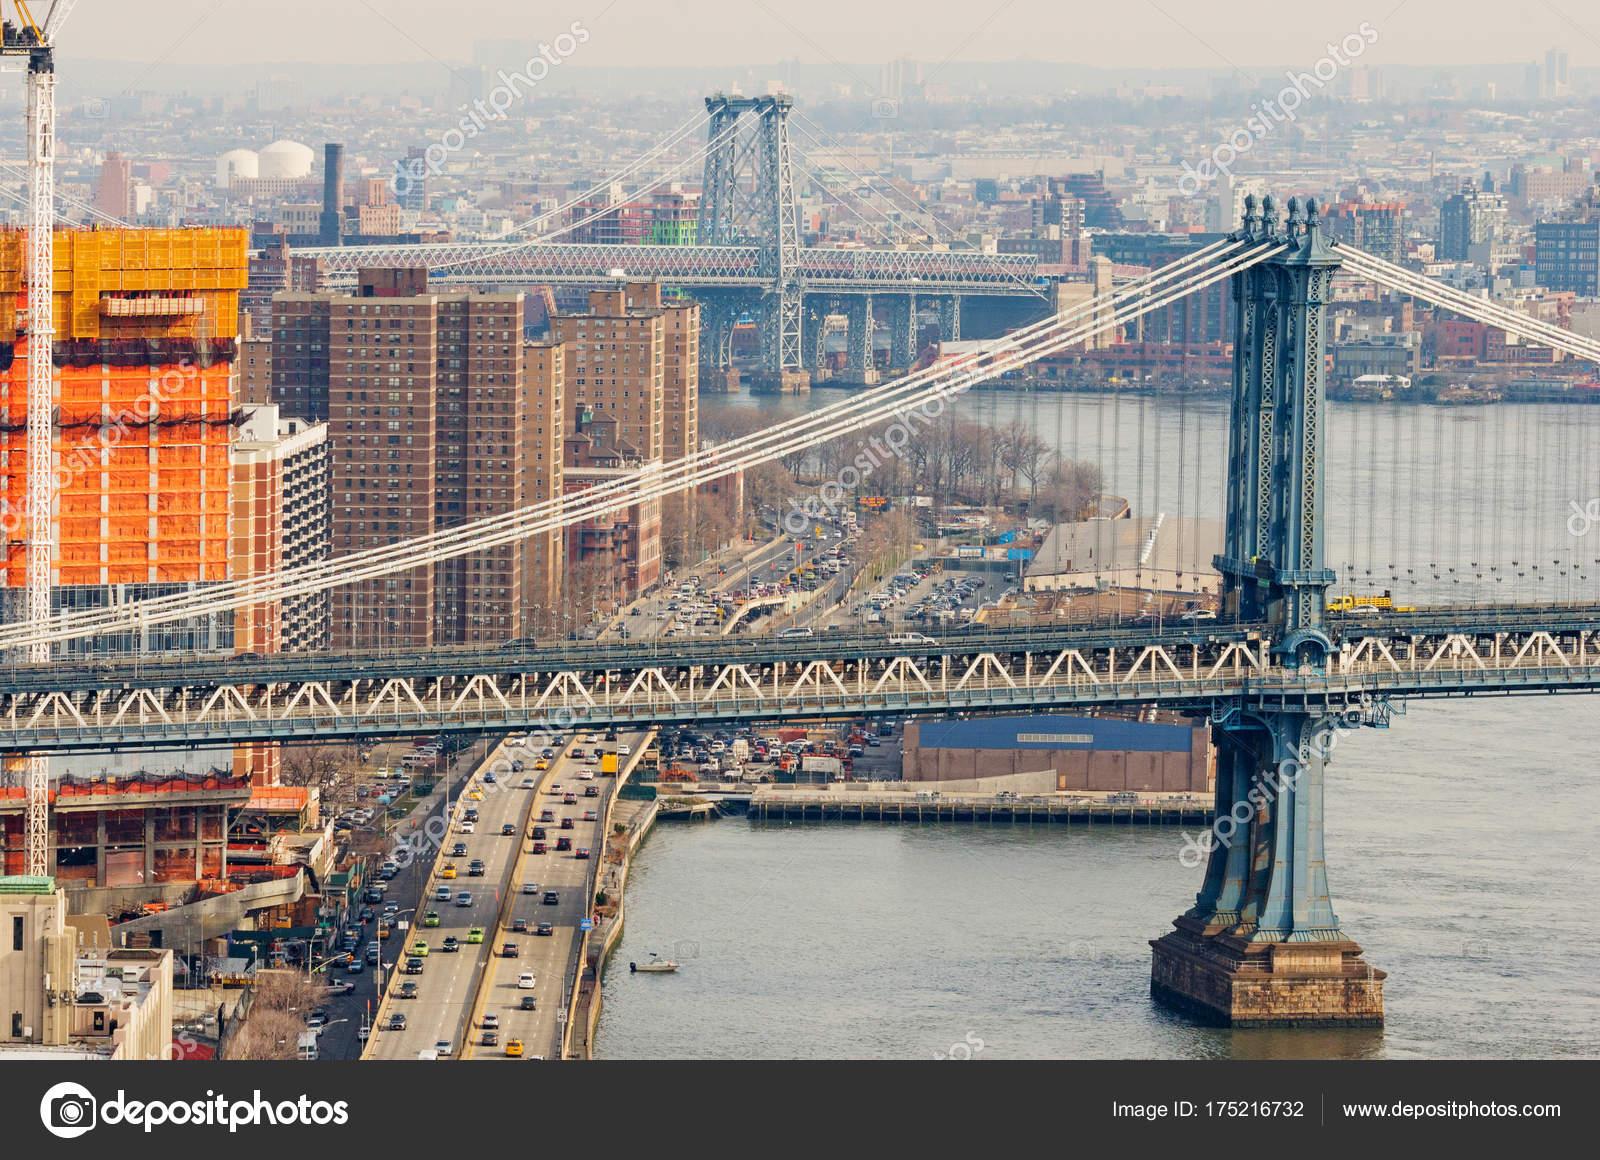 d7d50c15761 New York City Usa December 2016 View Manhattan Williamsburg Bridge ...